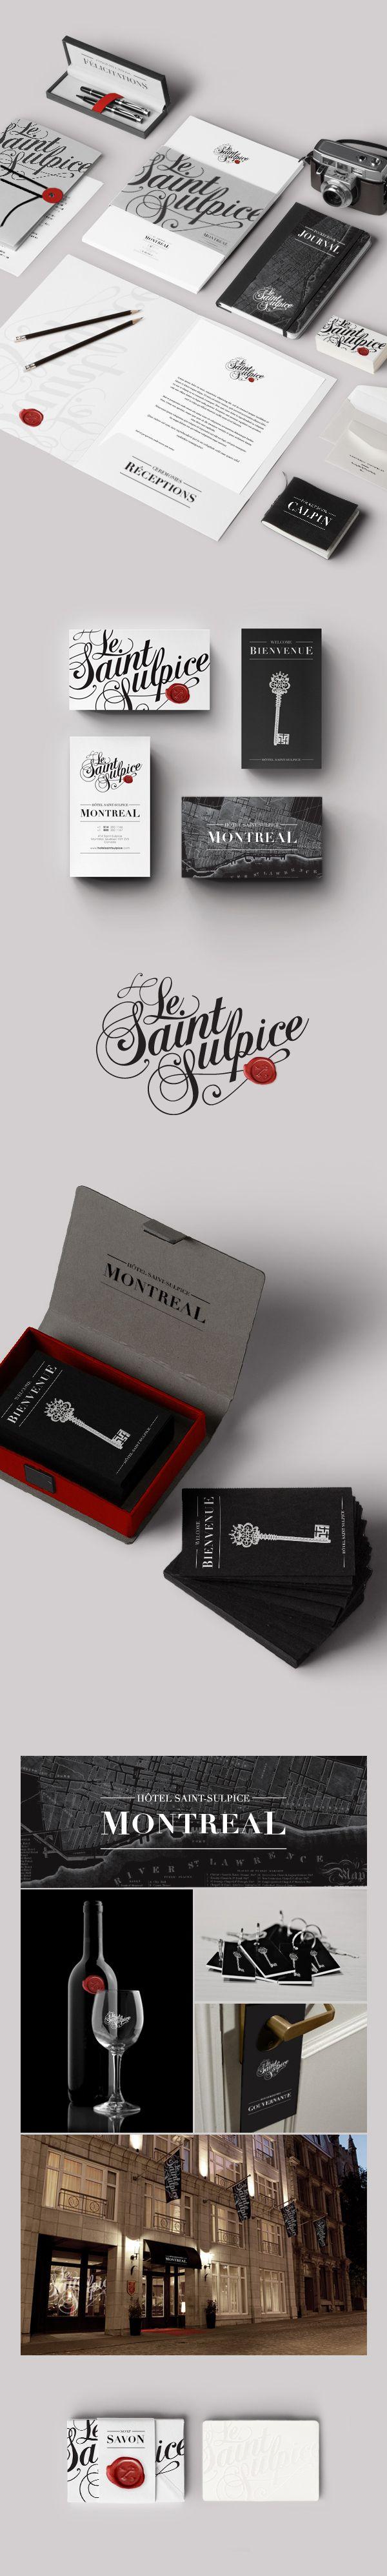 Identity / Saint-Sulpice Hotel Montreal by Carolane Godbout